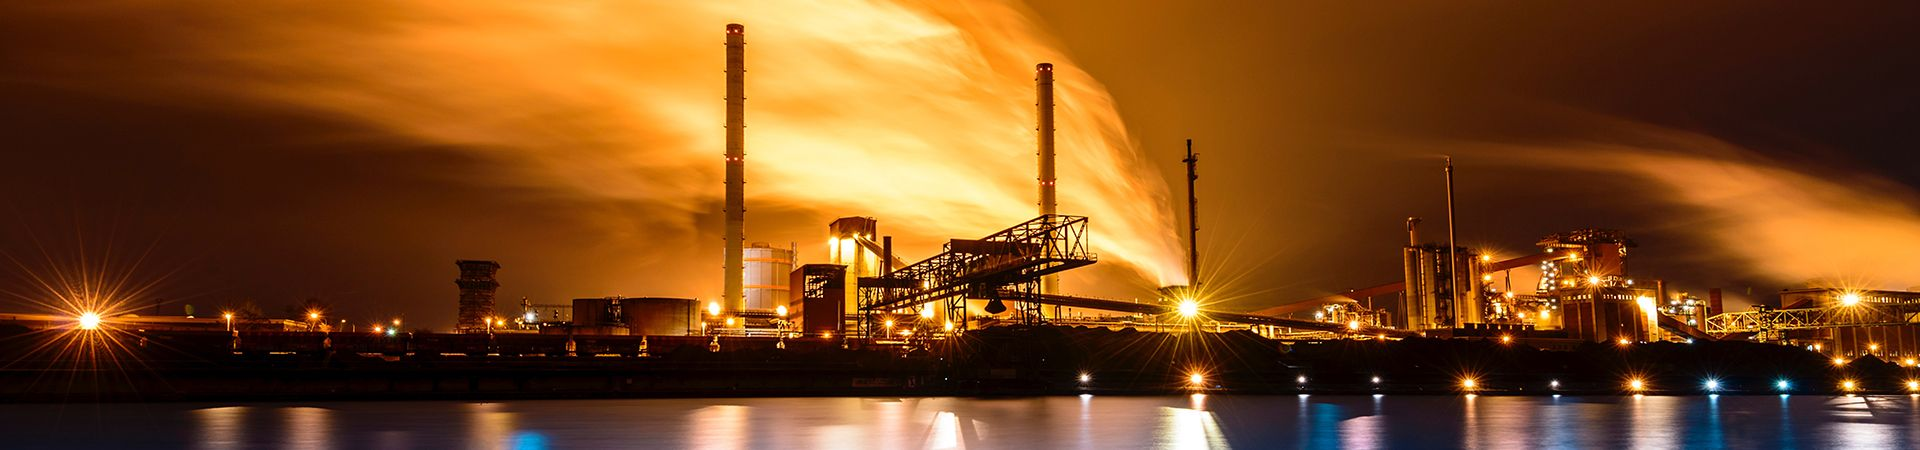 Industrii - Sigilii Industriale